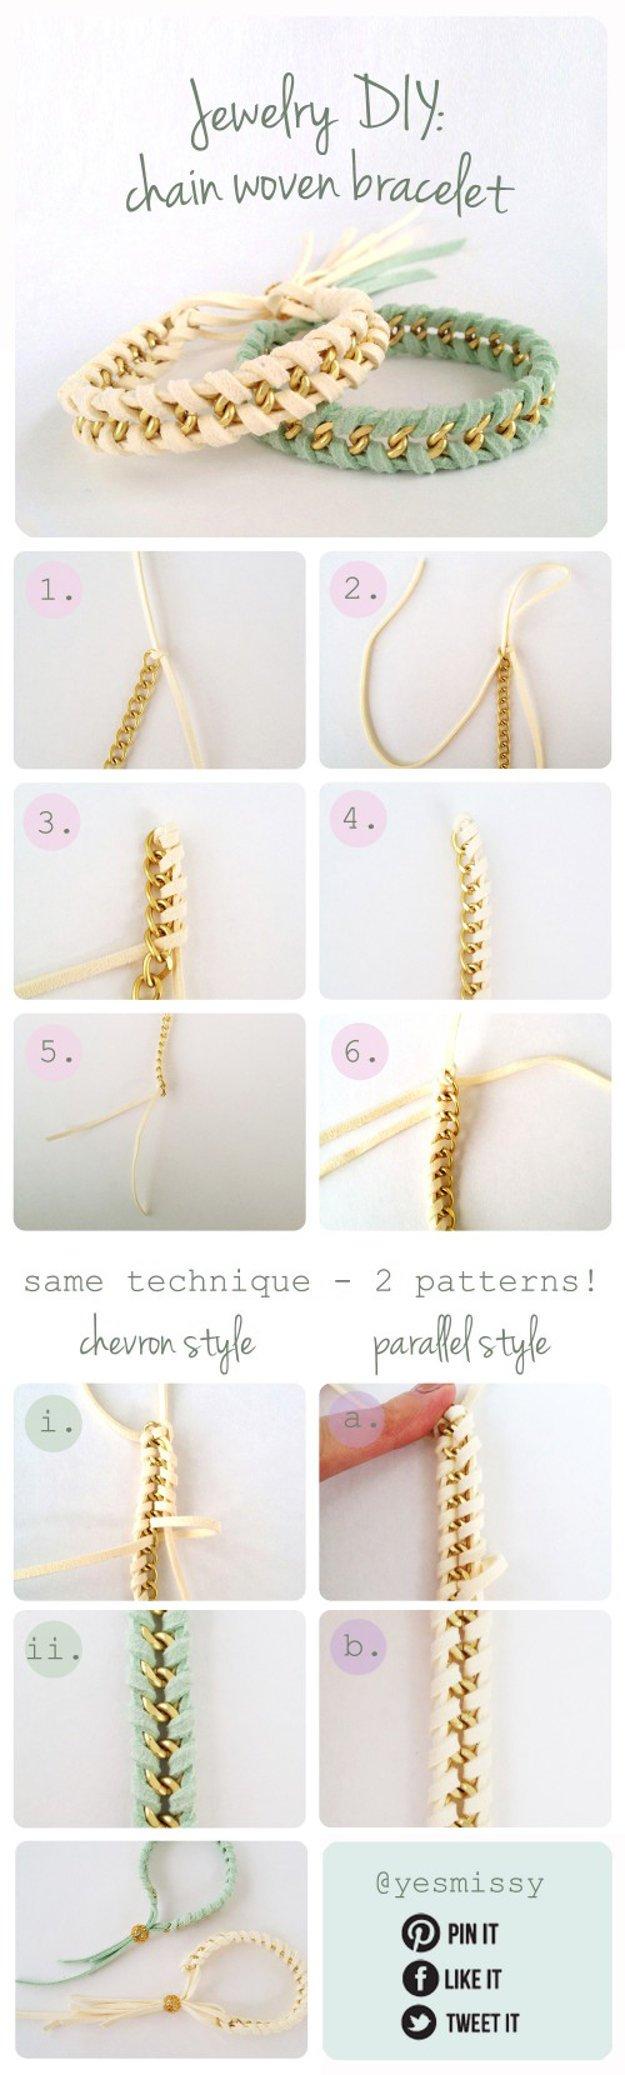 chain woven bracelet